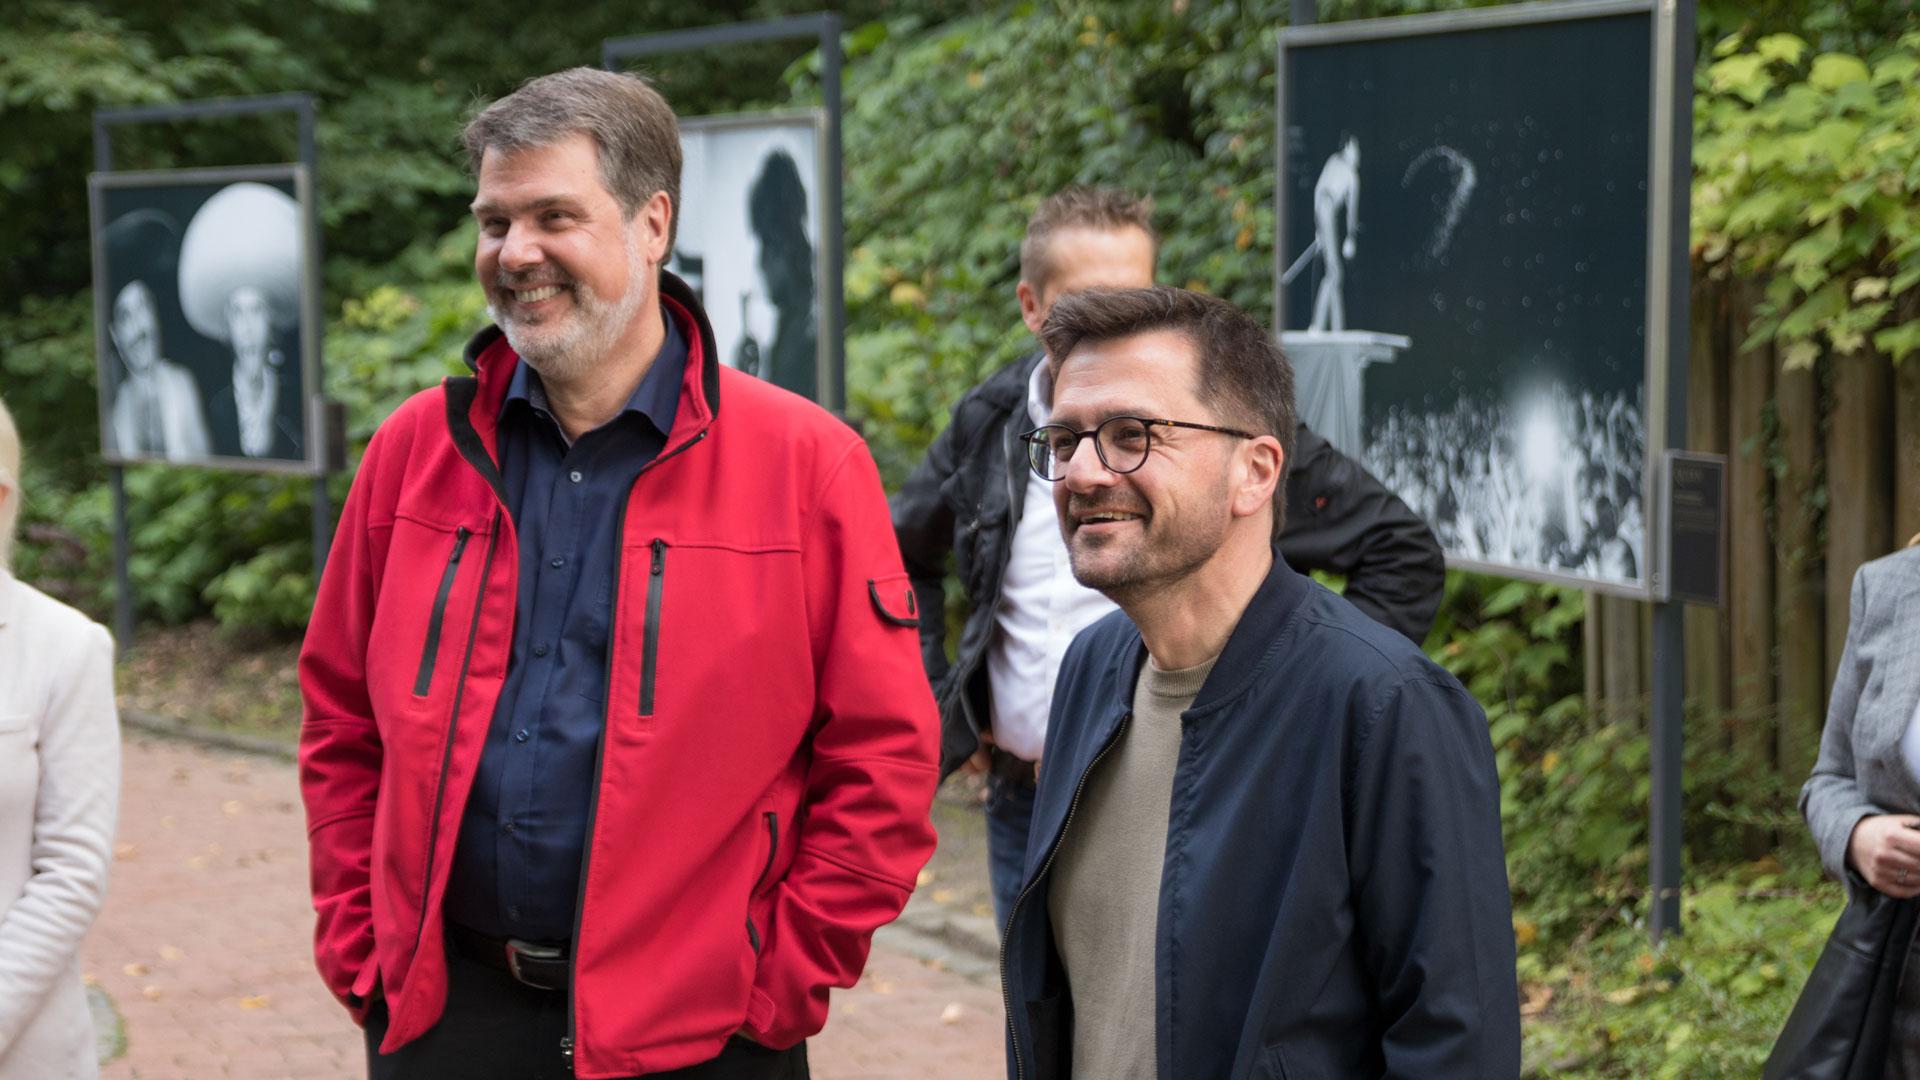 Vom Potenzial des Maximilianparks Hamm überzeugt